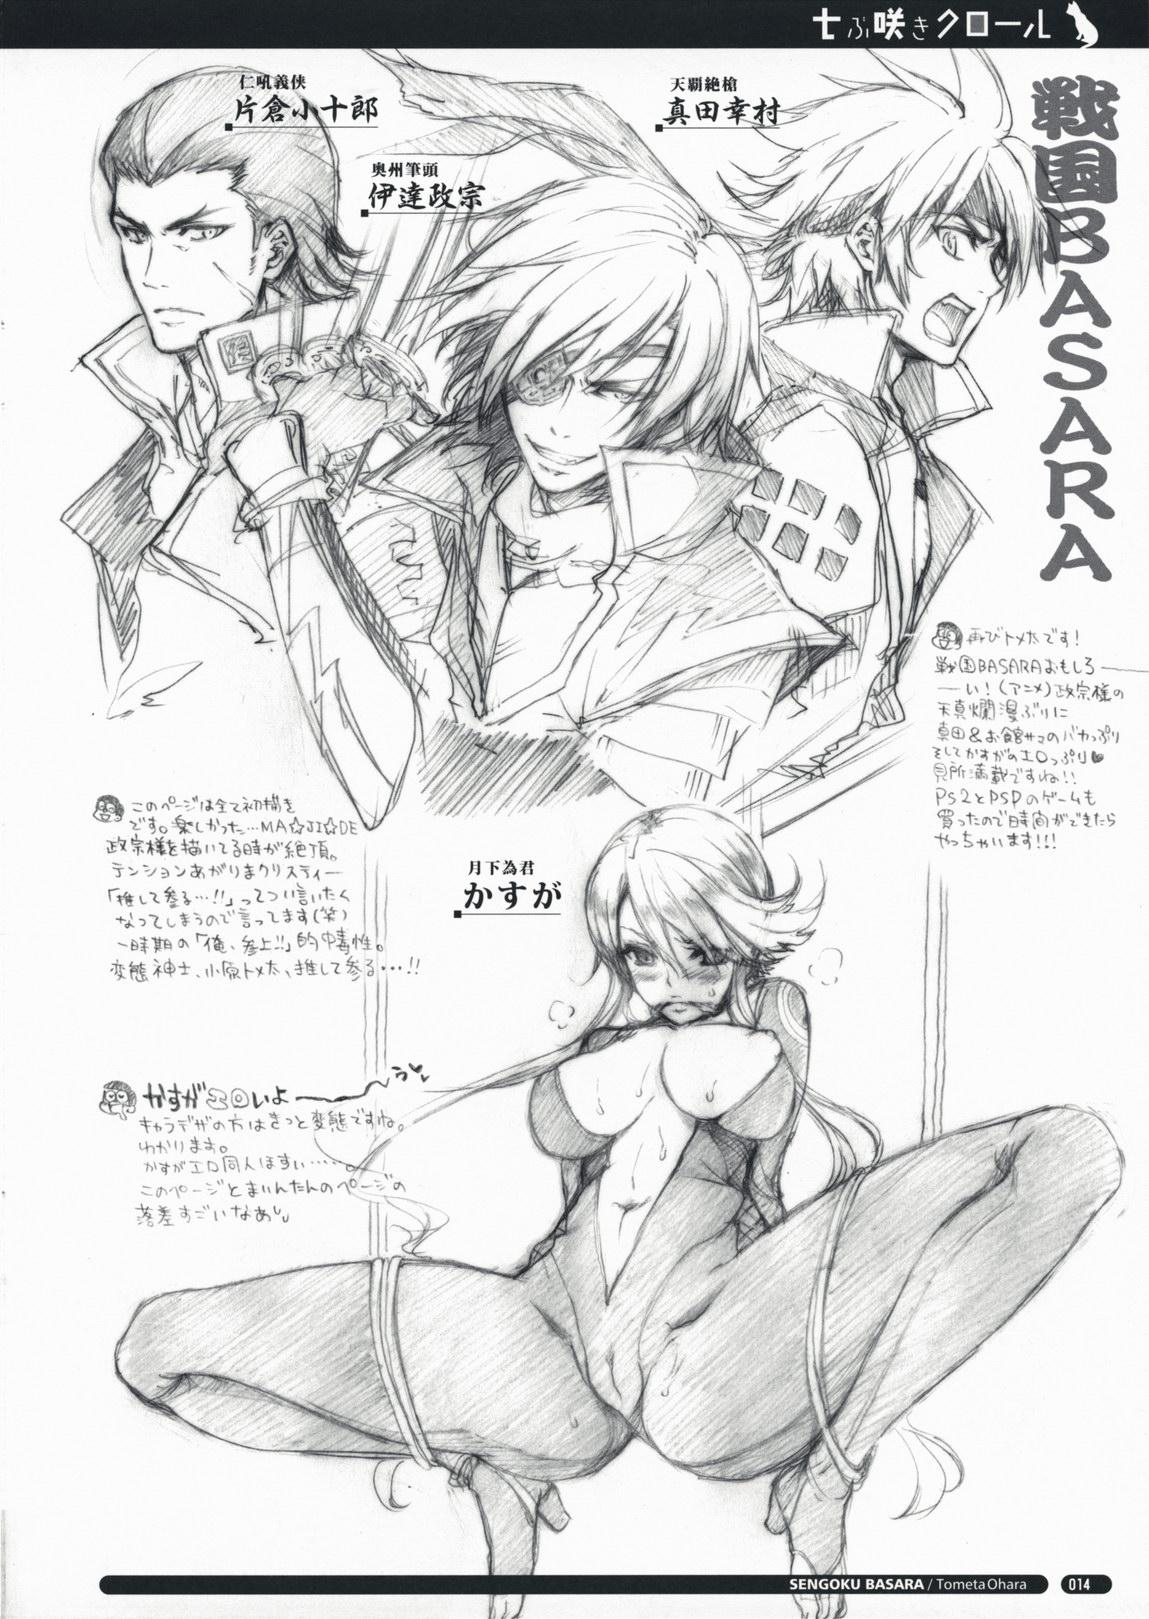 Shichibuzaki Crawl 13